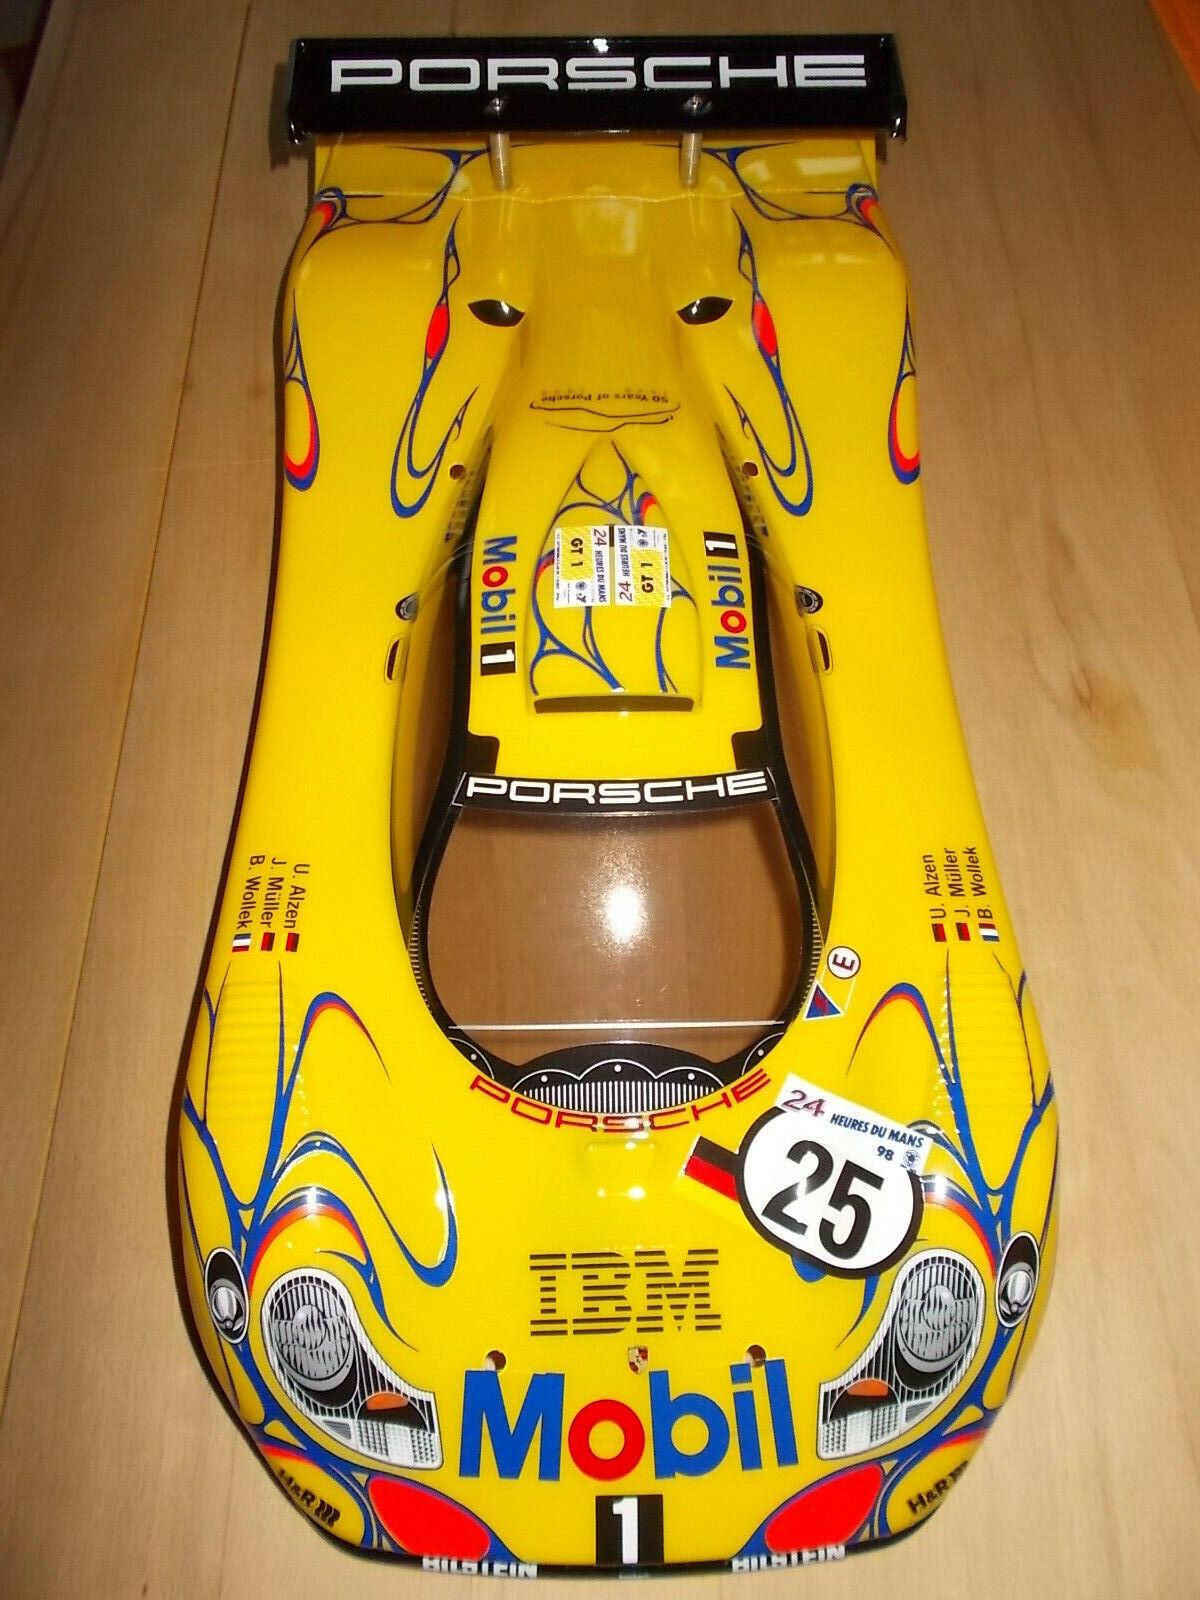 Tamiya 50826 Porsche 911 gt1 Cocherocería construido frase en amarillo, 1 10, 1 10, nuevo, New